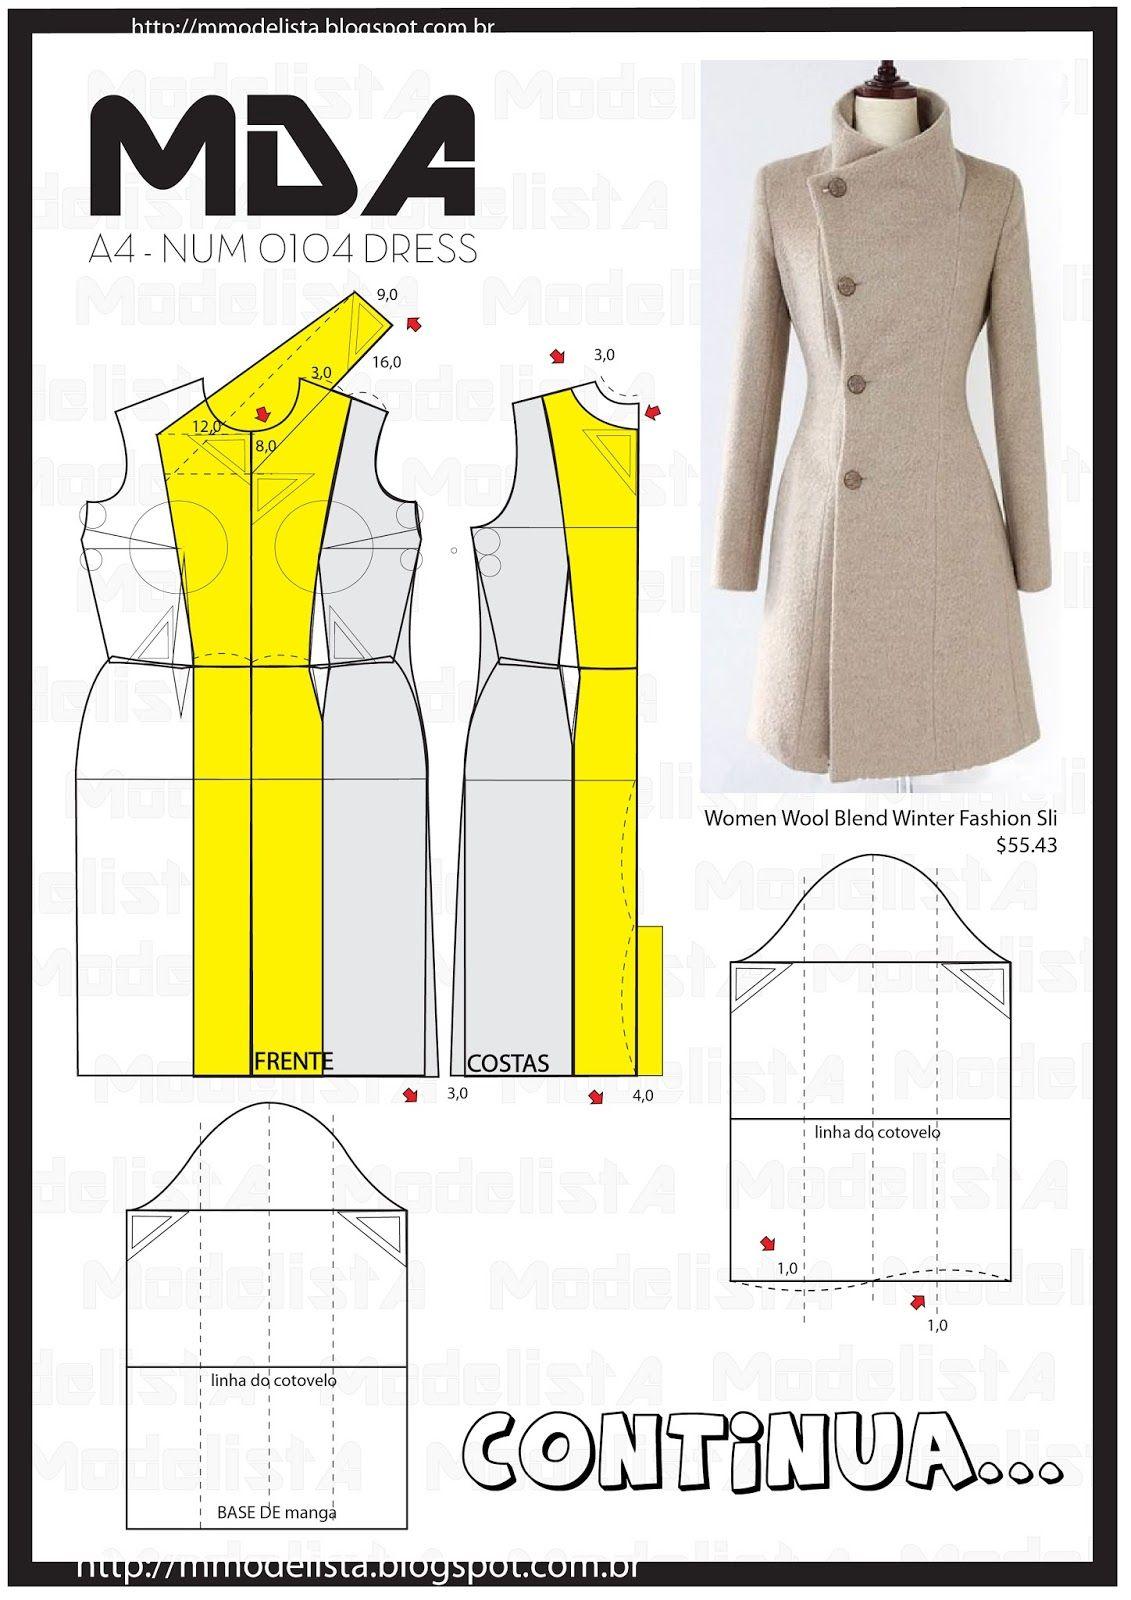 A4+NUMERO+104+DRESS+-04.jpg 1,131×1,600픽셀